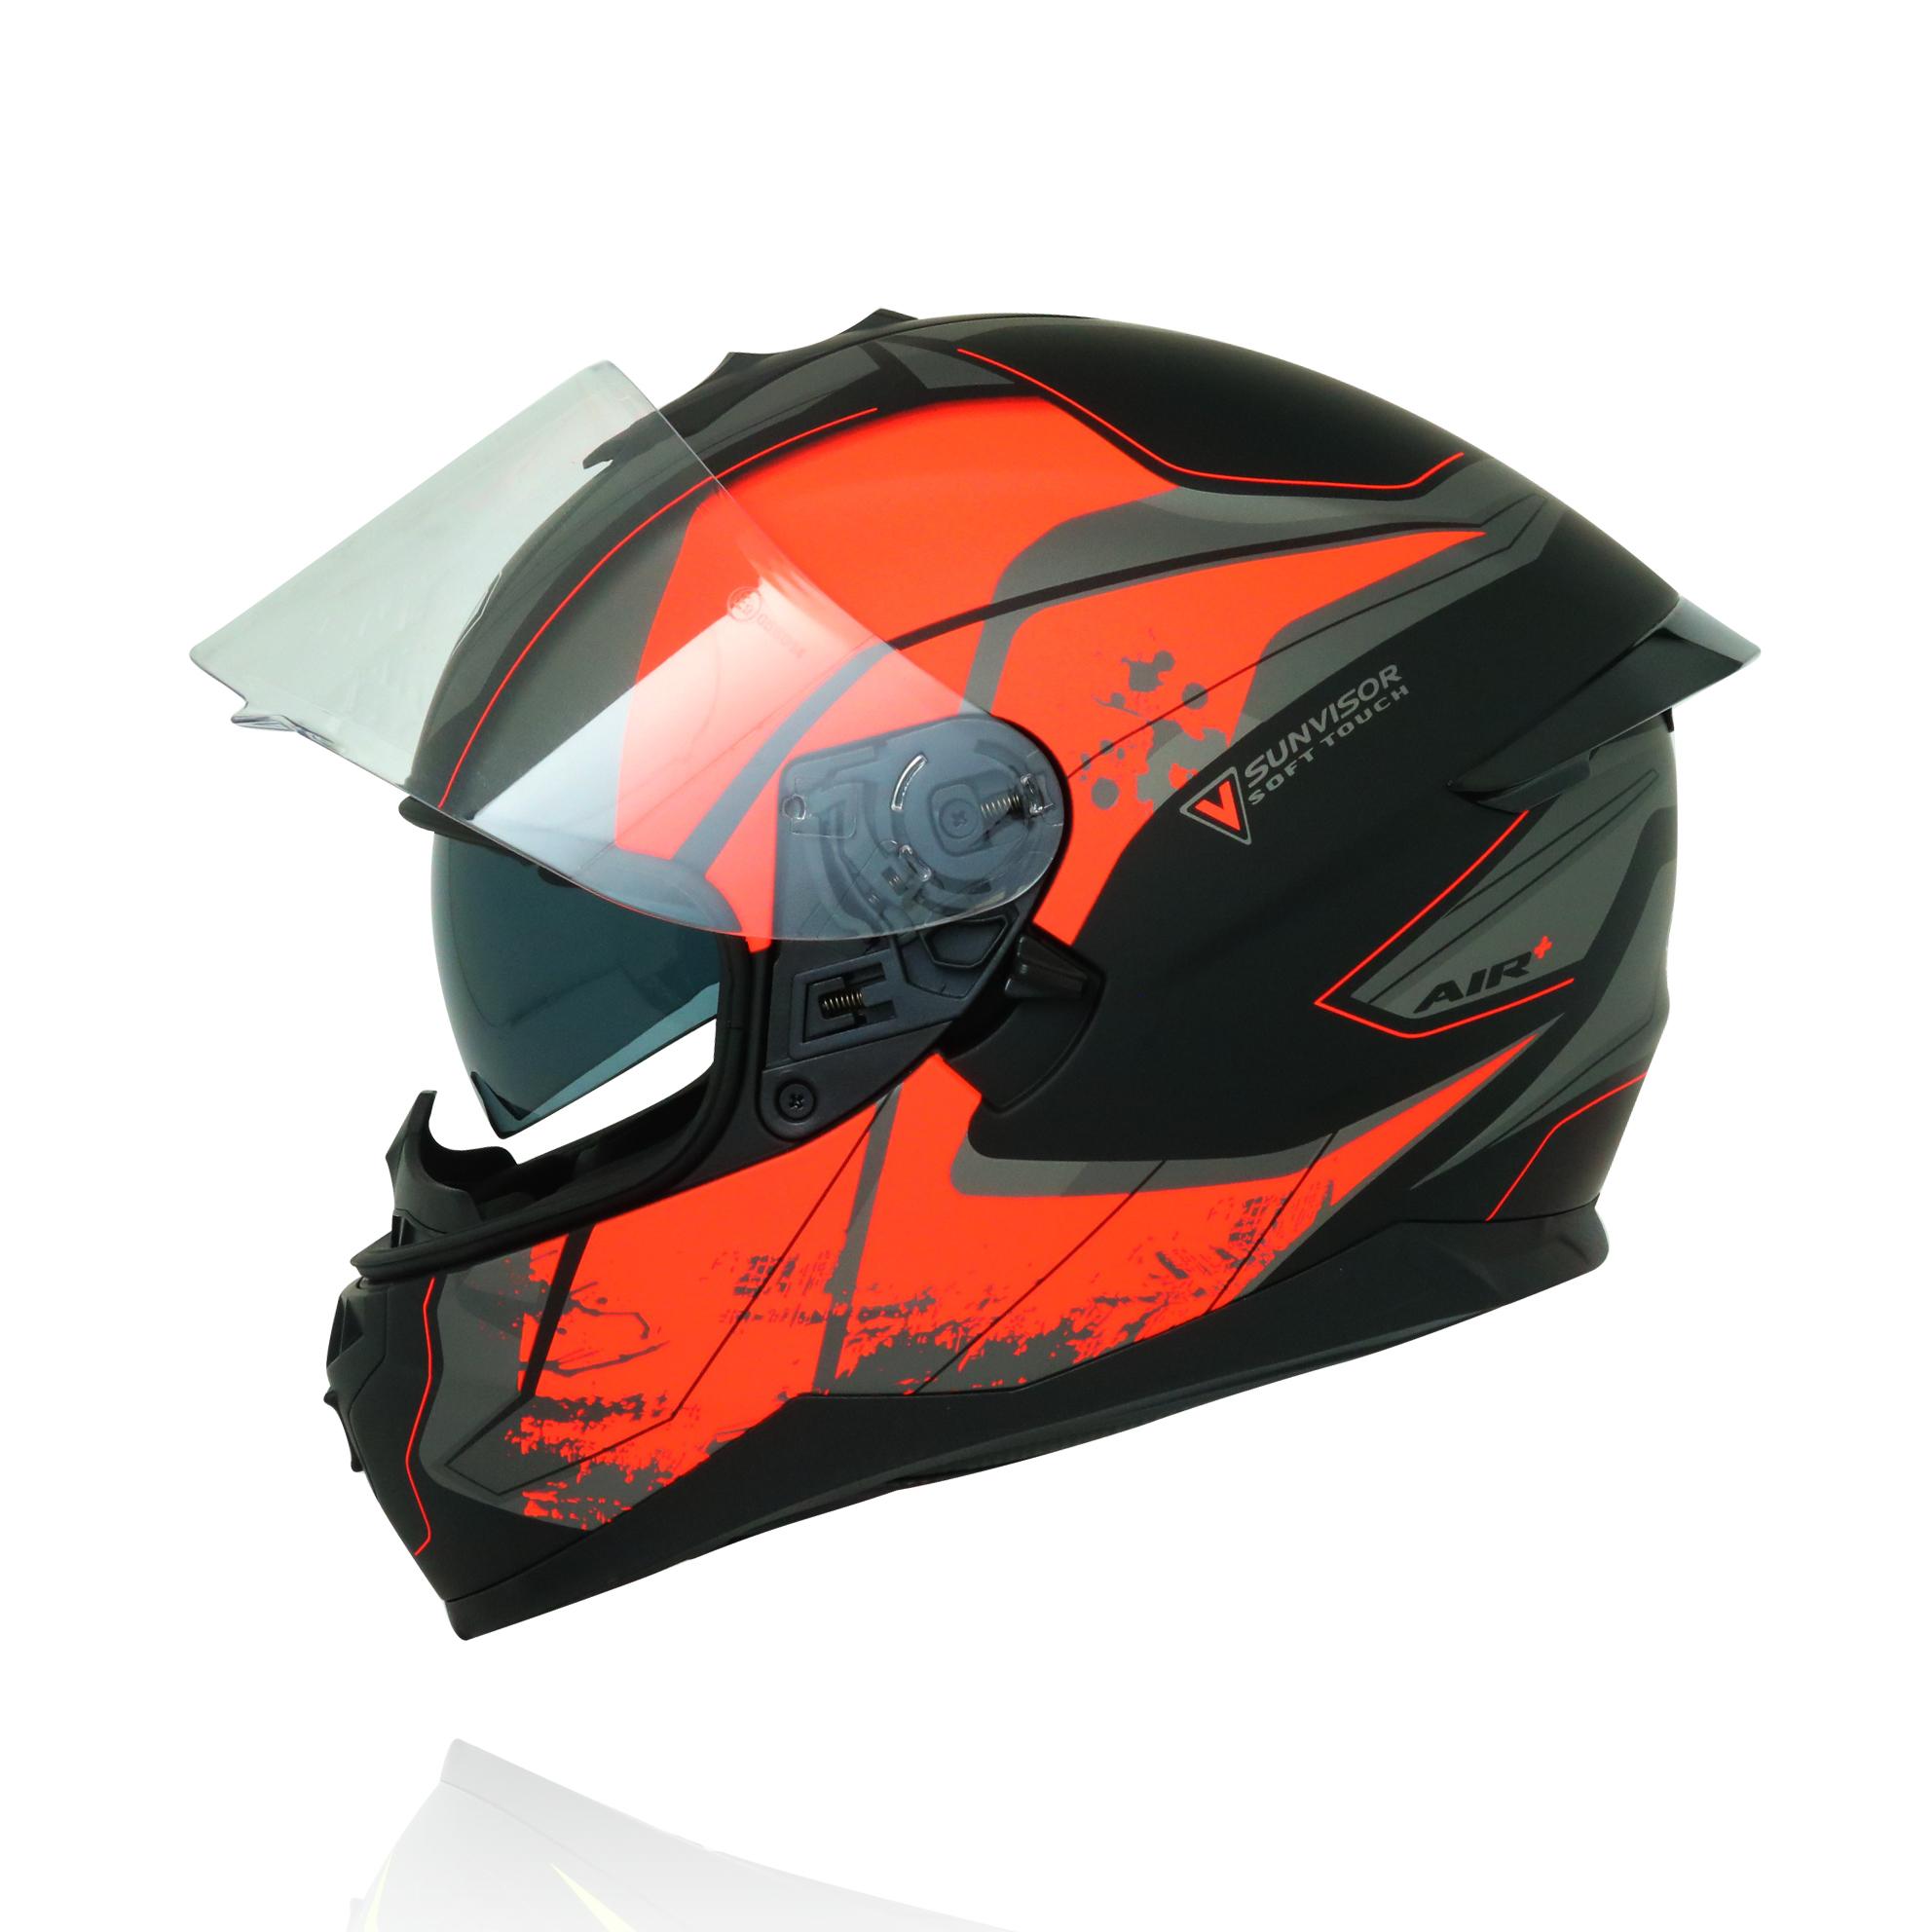 Mũ bảo hiểm fullface Yohe 967 2 kính tem đen cam